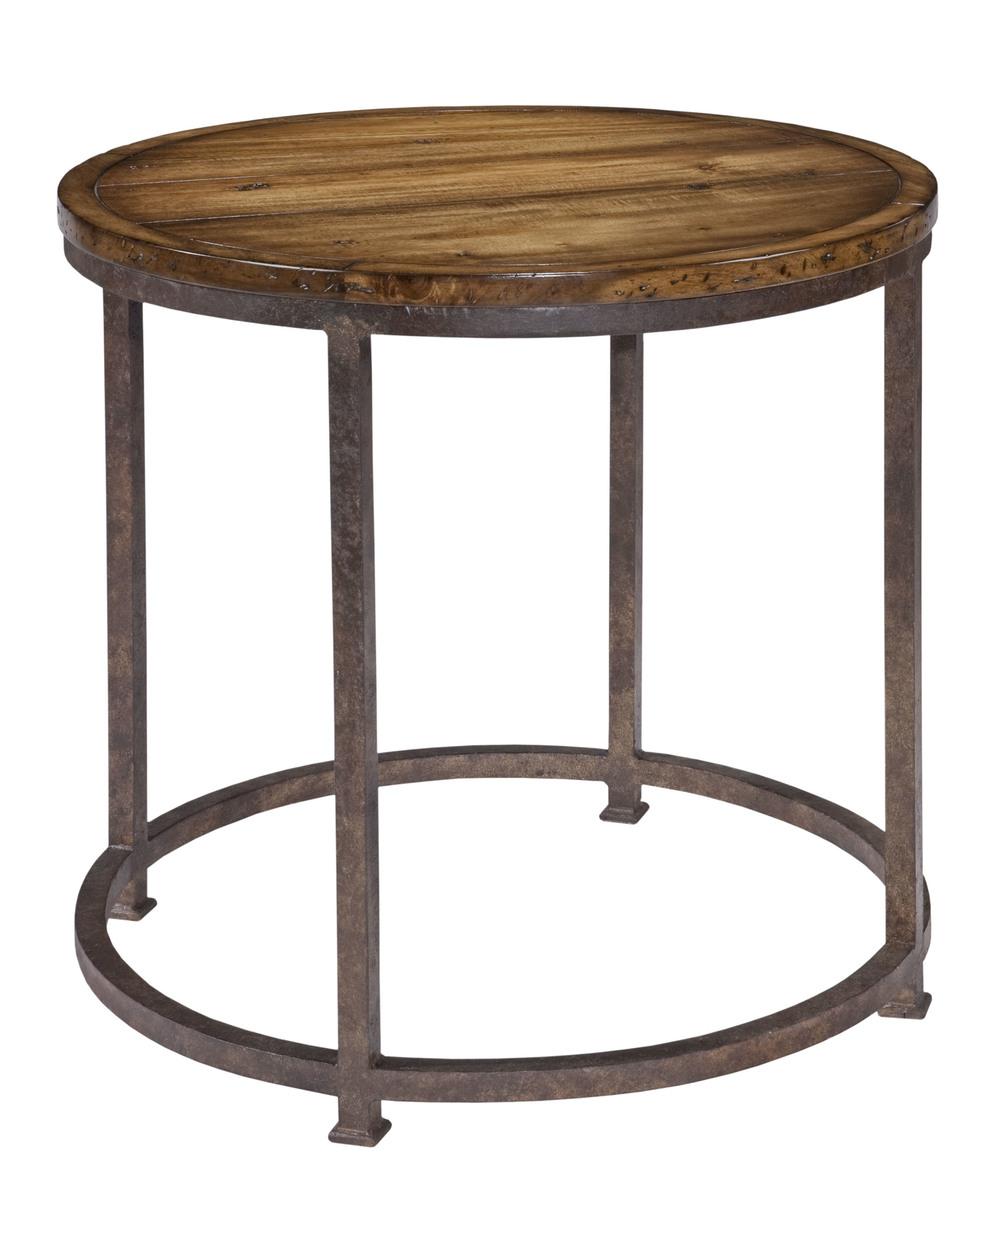 Woodbridge Furniture Company - Utilitaire Side Table